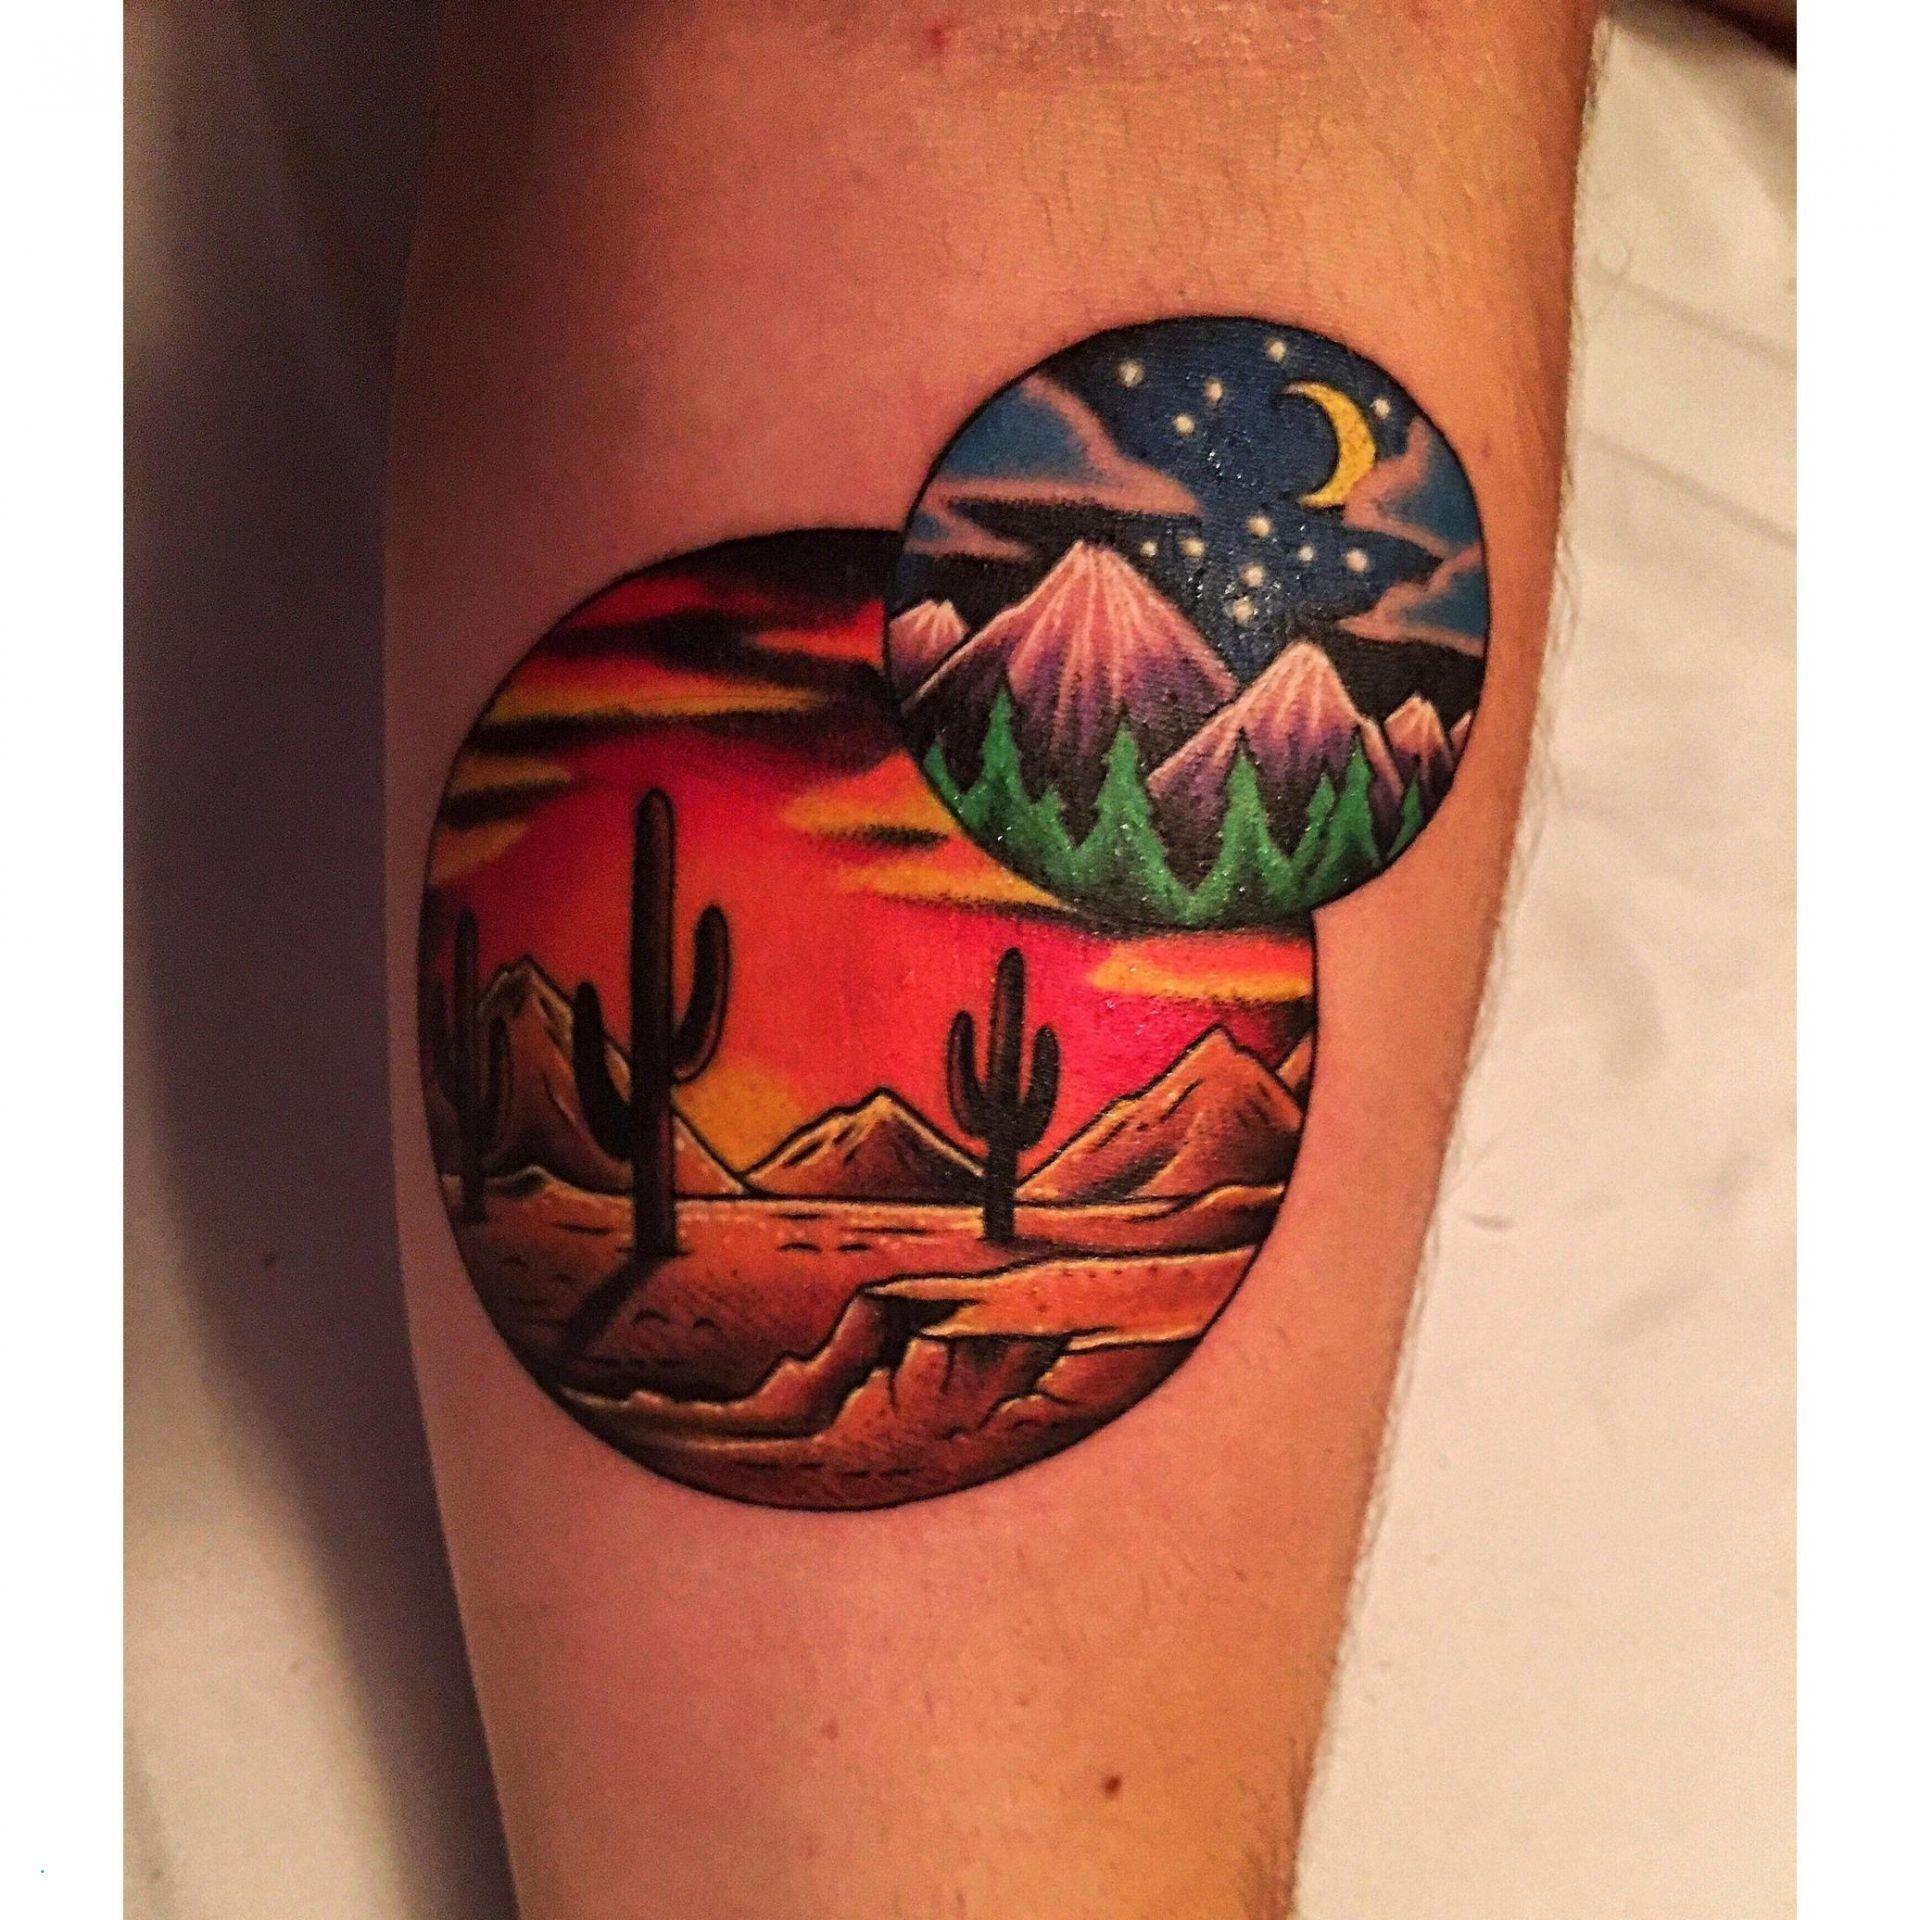 Kalinda Cano Tatuajes cactus desert tattoo beautiful tattoo cactus desert mountain arm